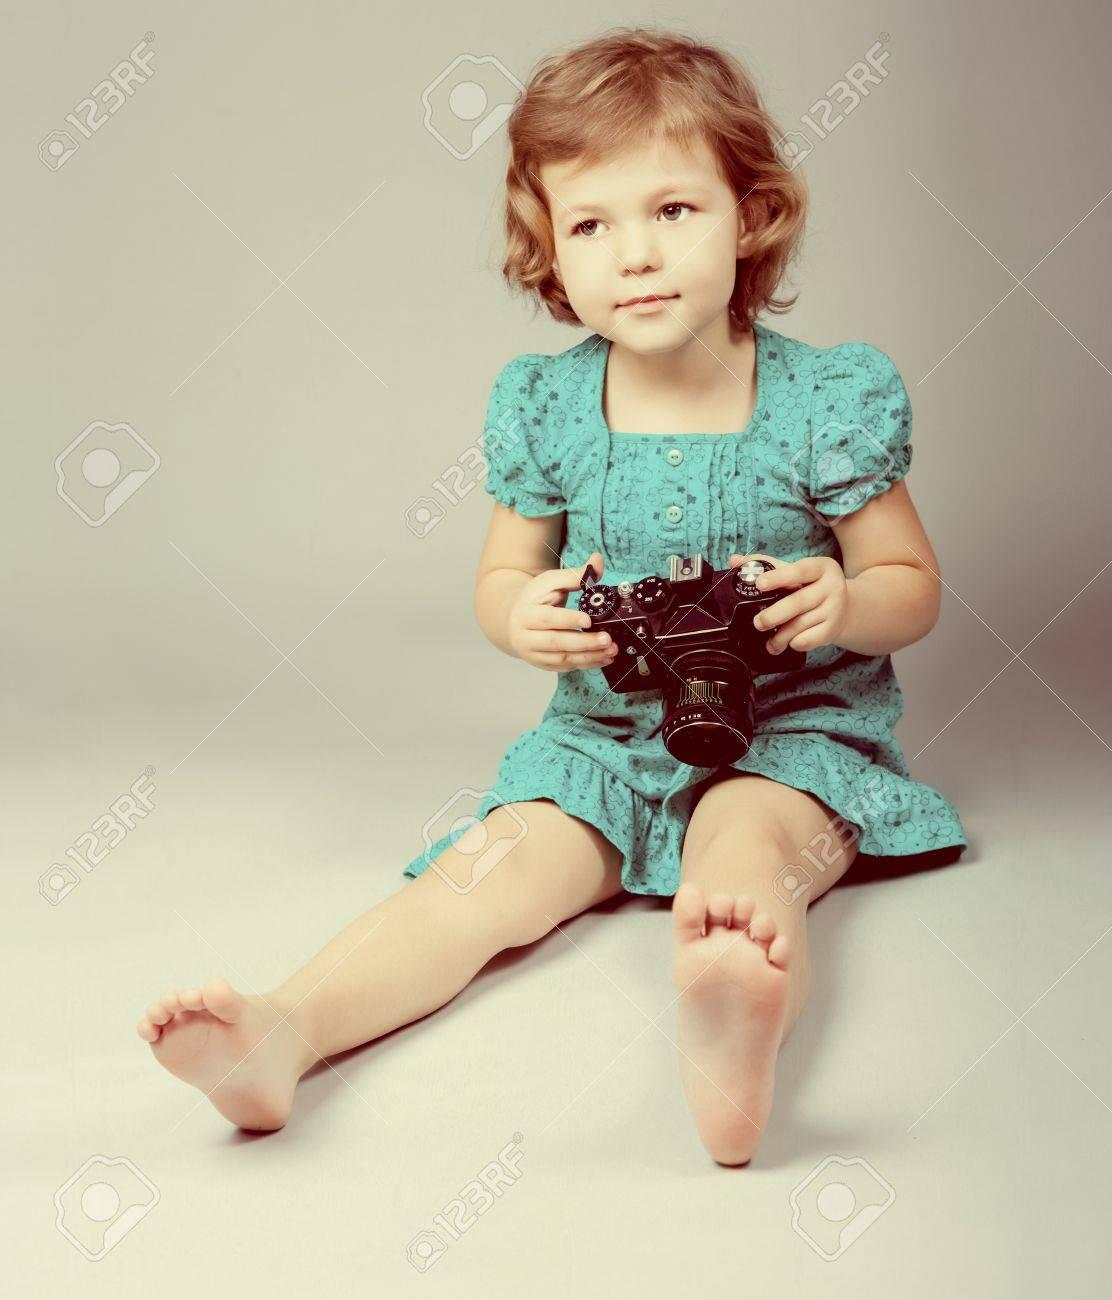 Portrait of baby girl holding photo camera Stock Photo - 13086612